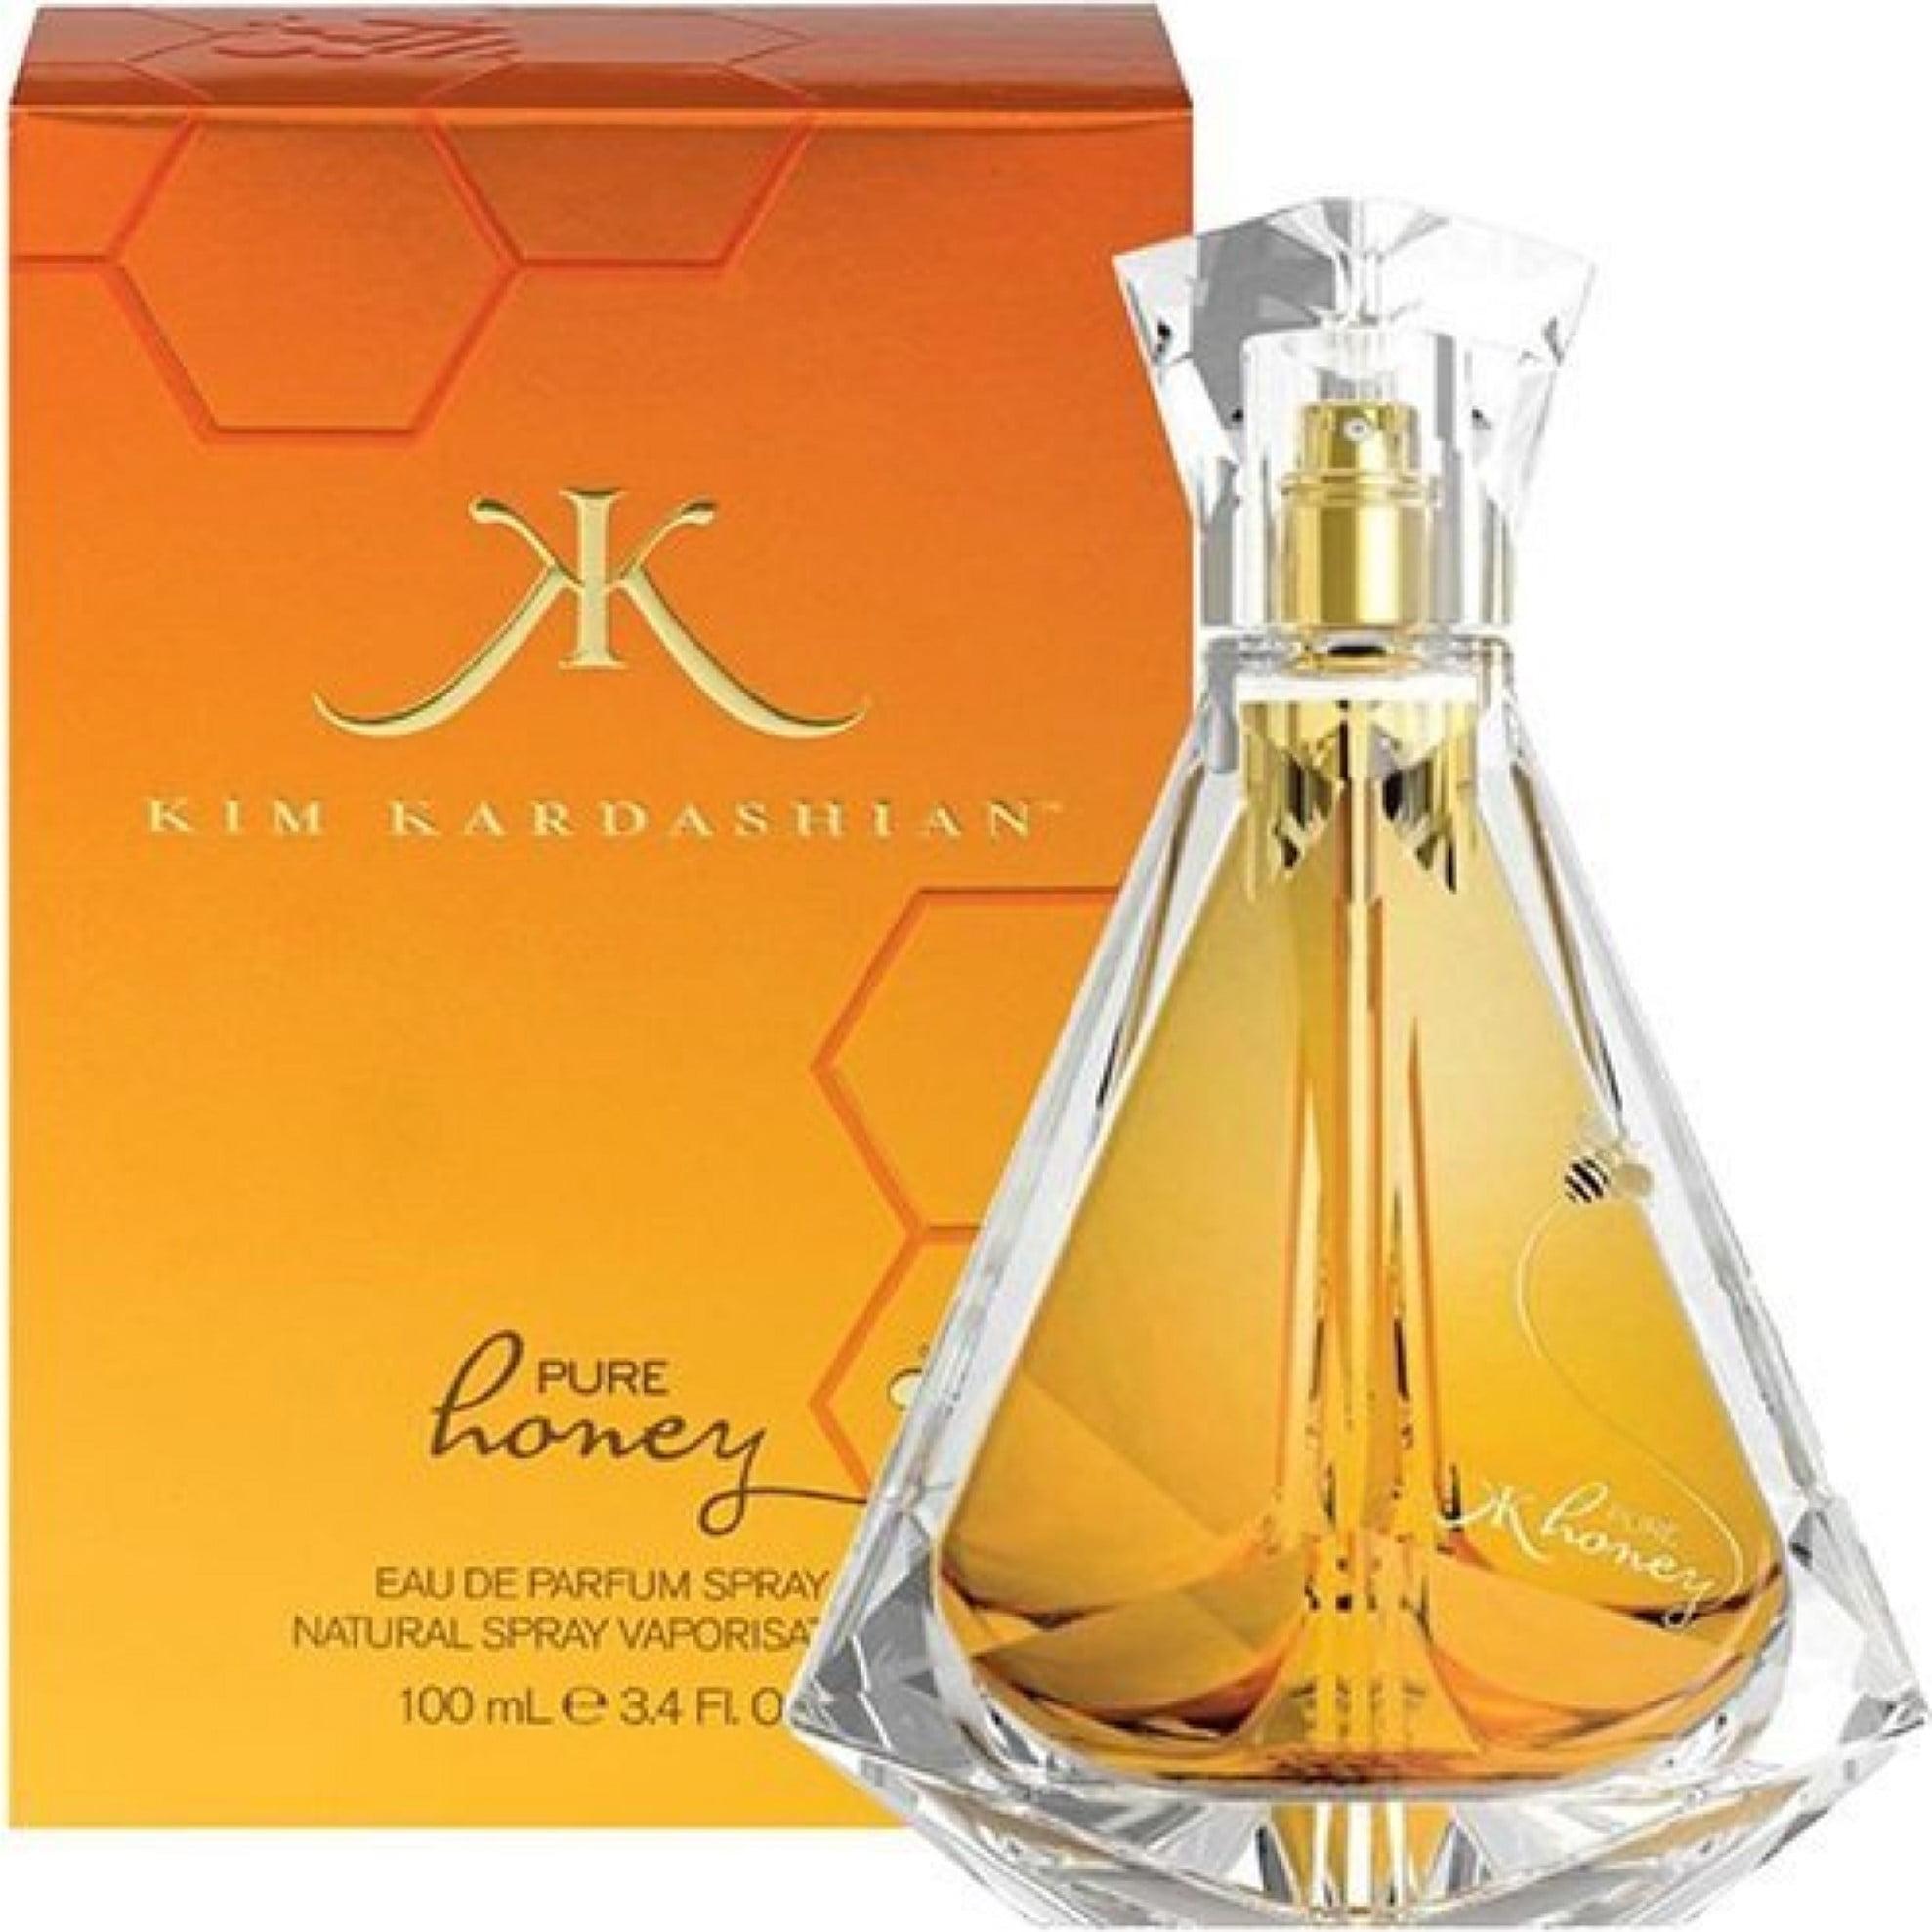 6 Pack - Pure Honey By Kim Kardashian Eau de Parfum Spray For Women 3.4 oz